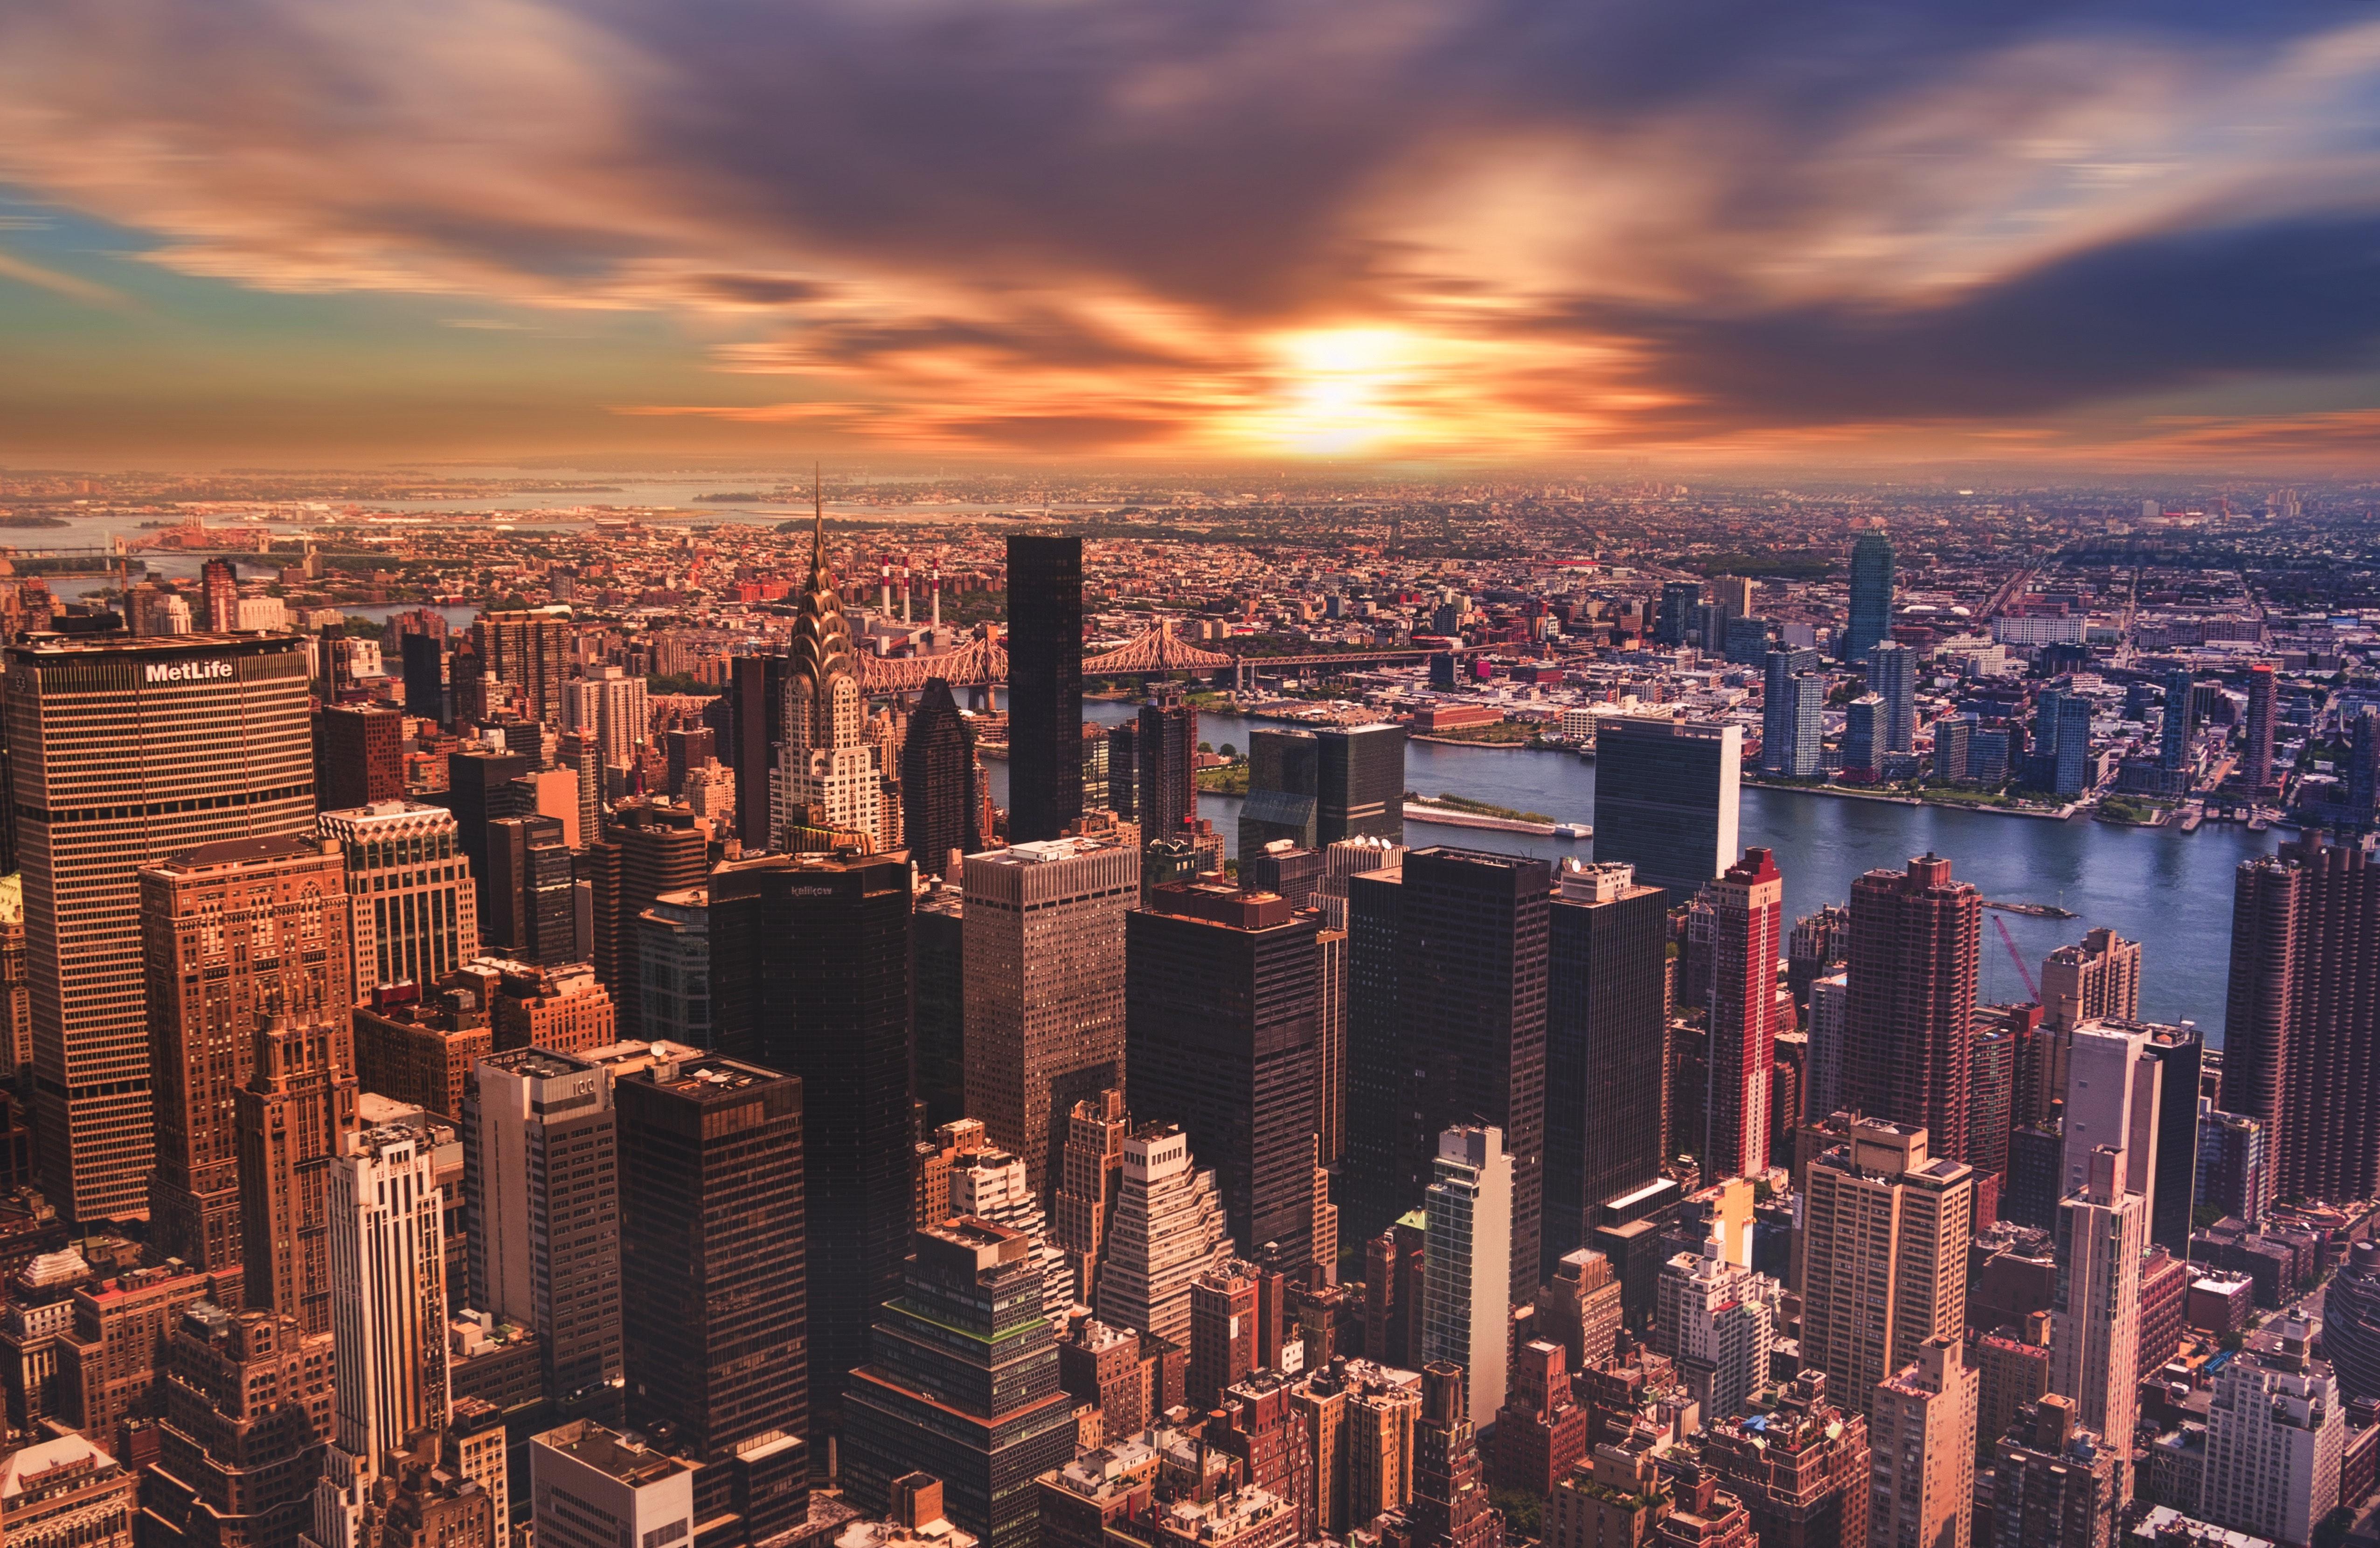 New York City Wallpaper · · Free Stock